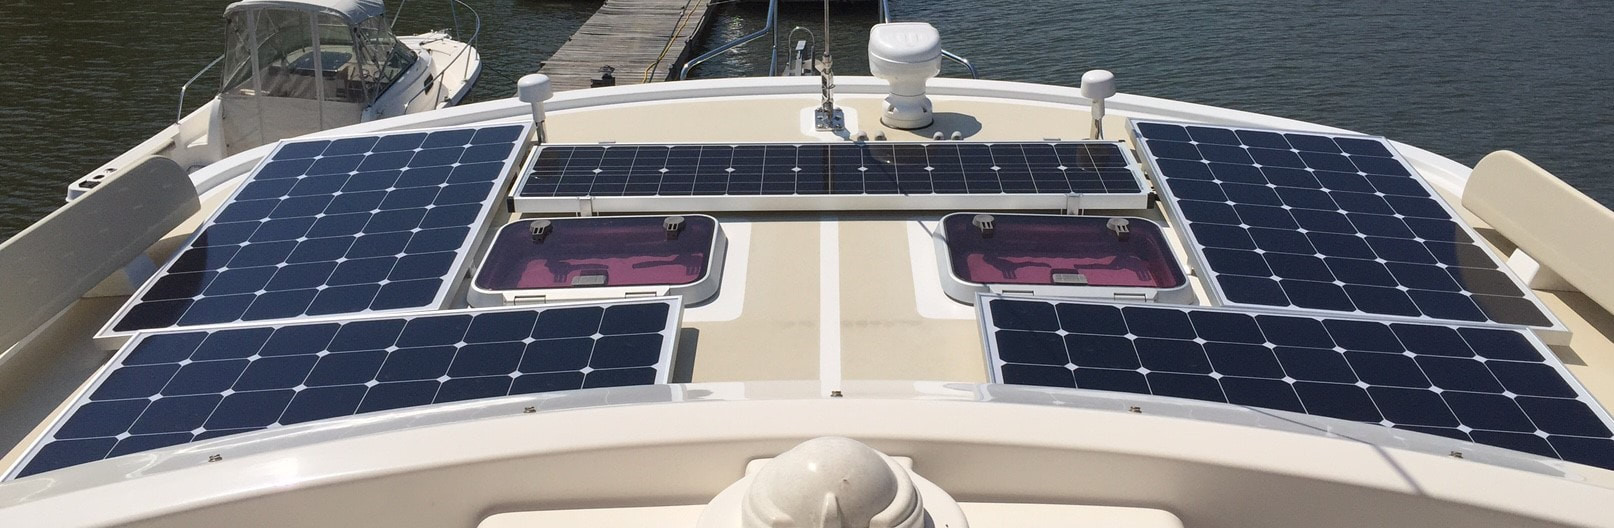 5-panel-sunpower-cell-system-b.jpg